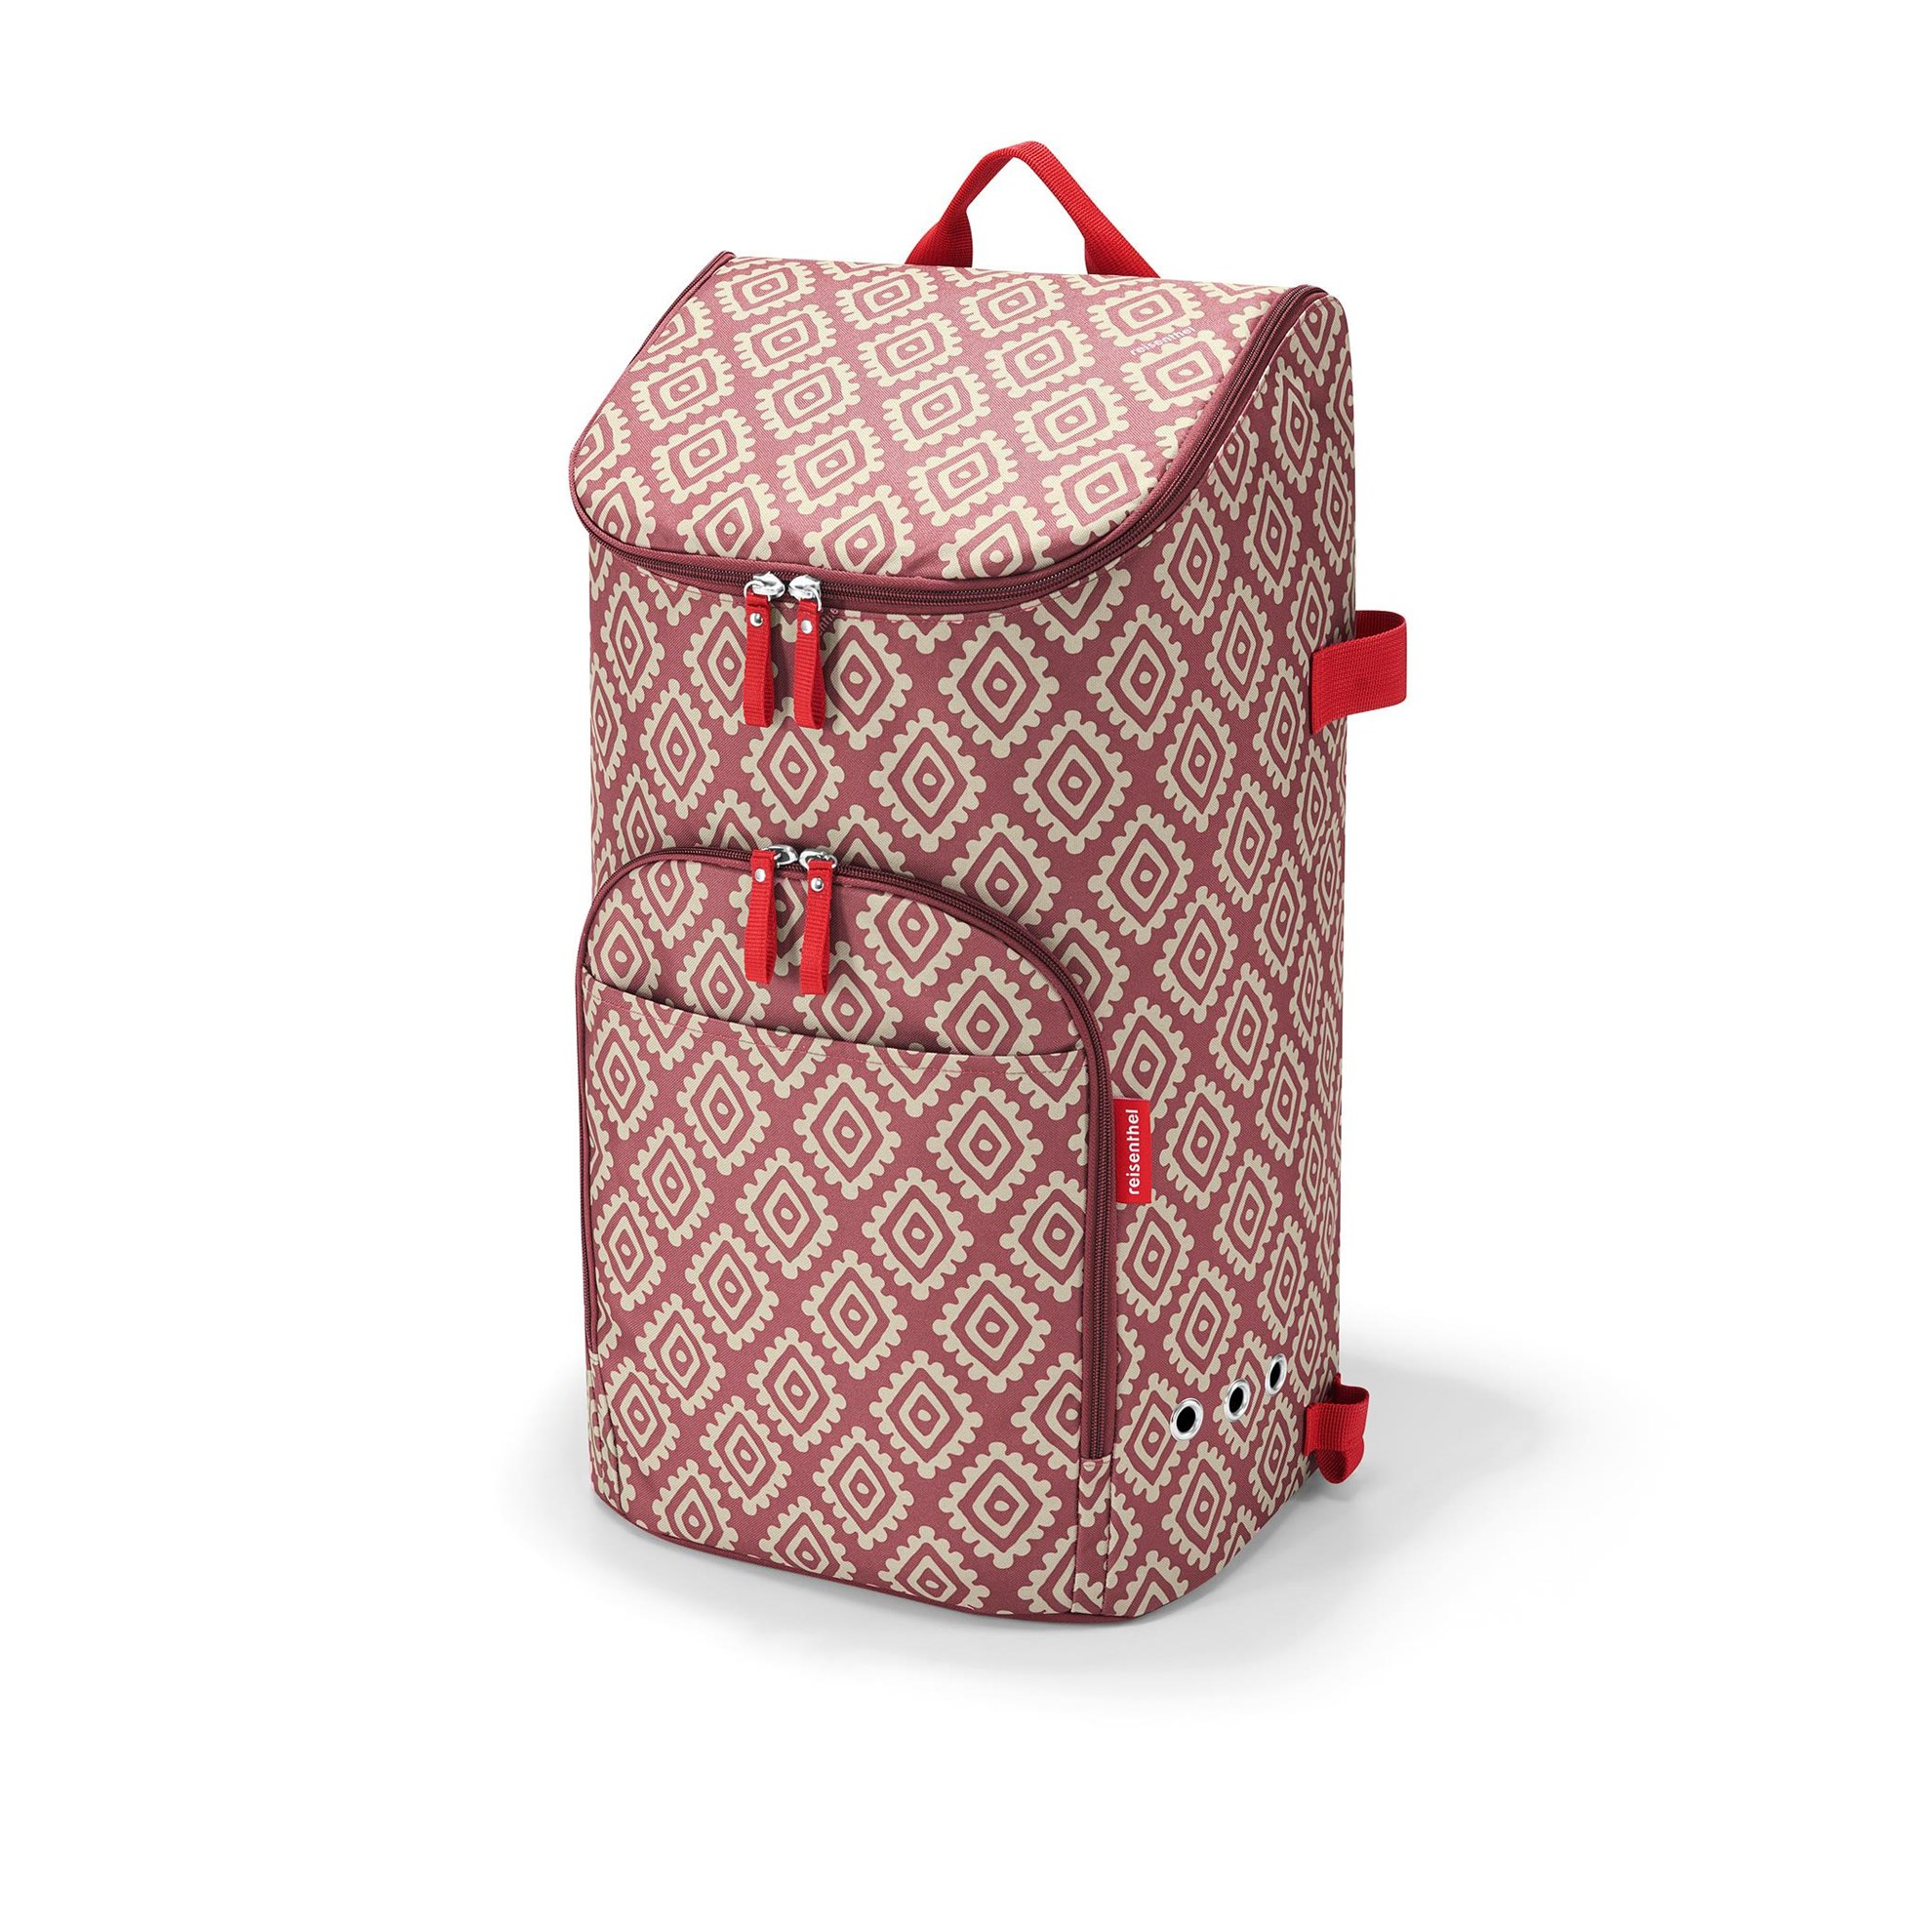 Taška CITYCRUISER diamonds rouge (bez vozíku)_4